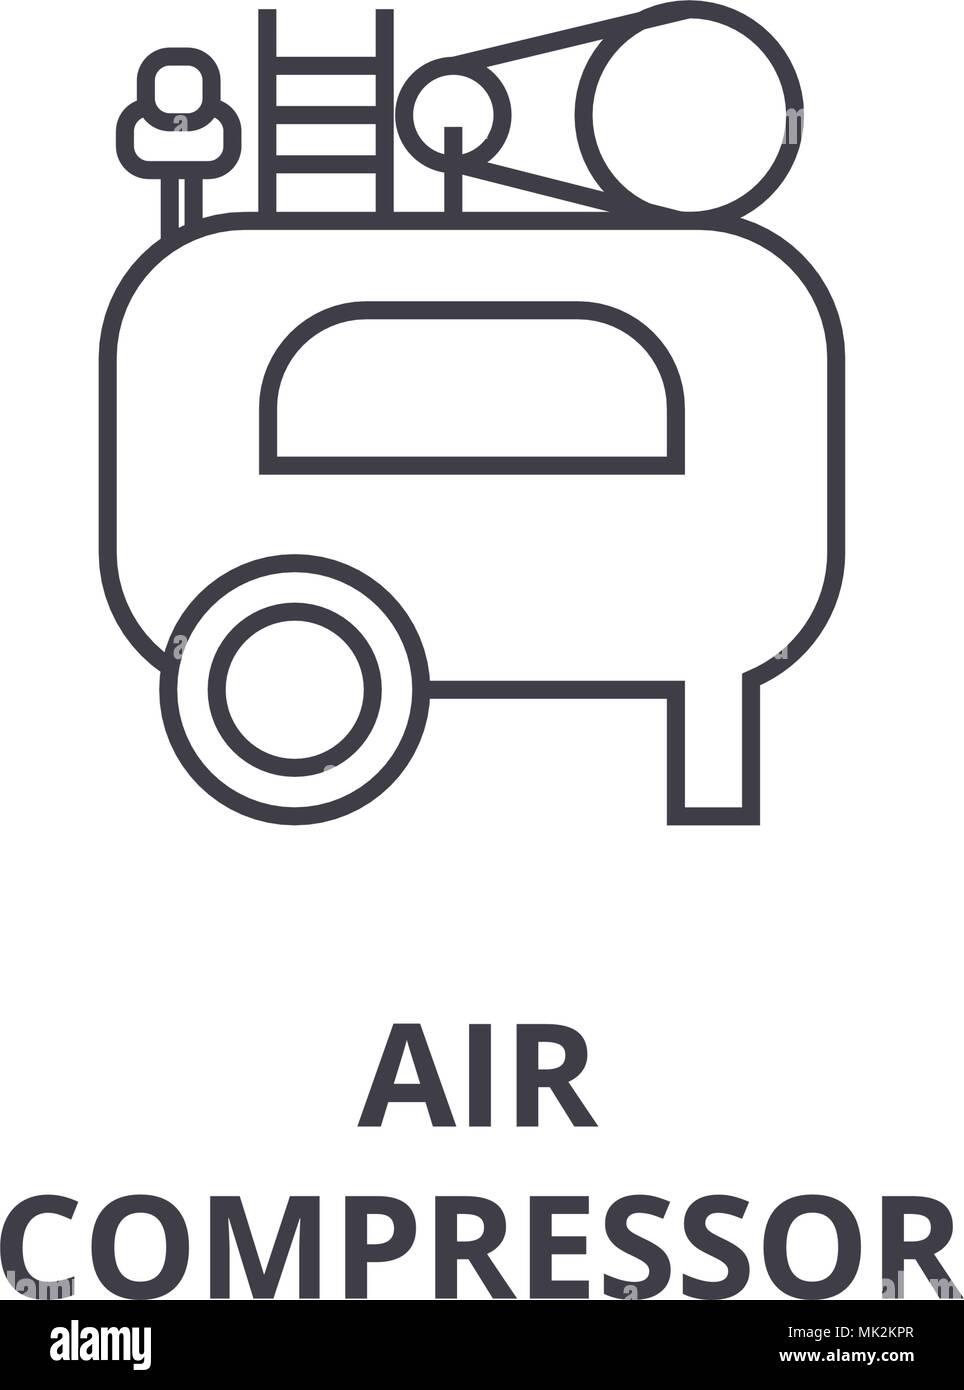 Air Compressor Icon Sign Vector Stock Vector Art Illustration